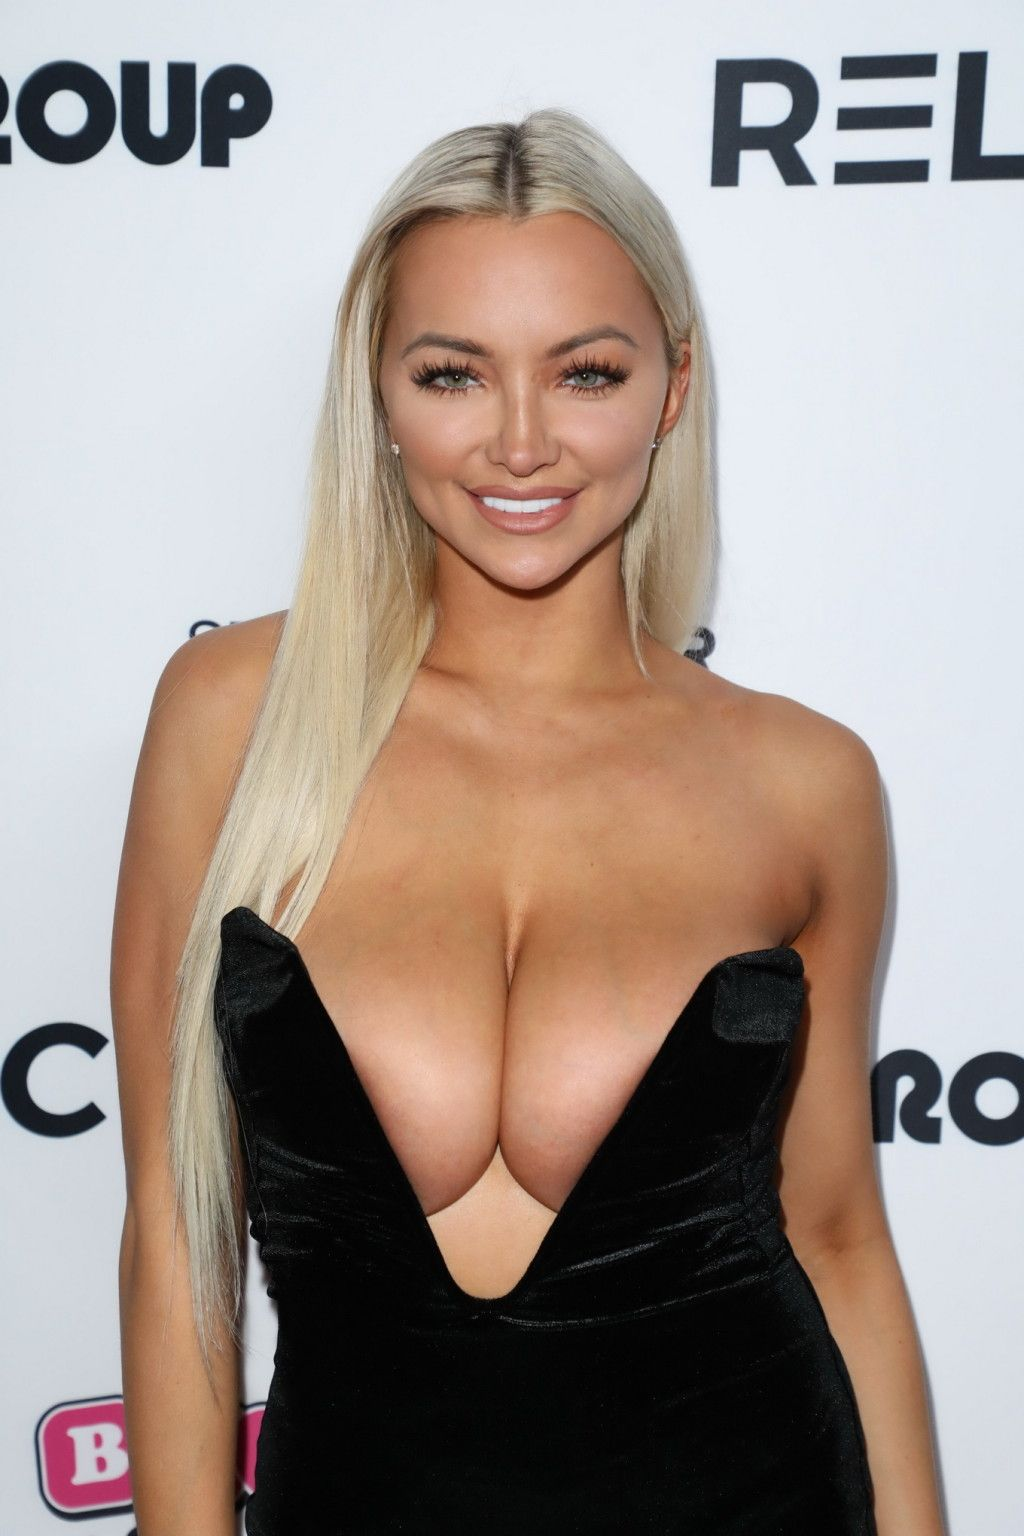 Boobs Sally Lindsay nudes (41 photos), Sexy, Leaked, Boobs, braless 2018